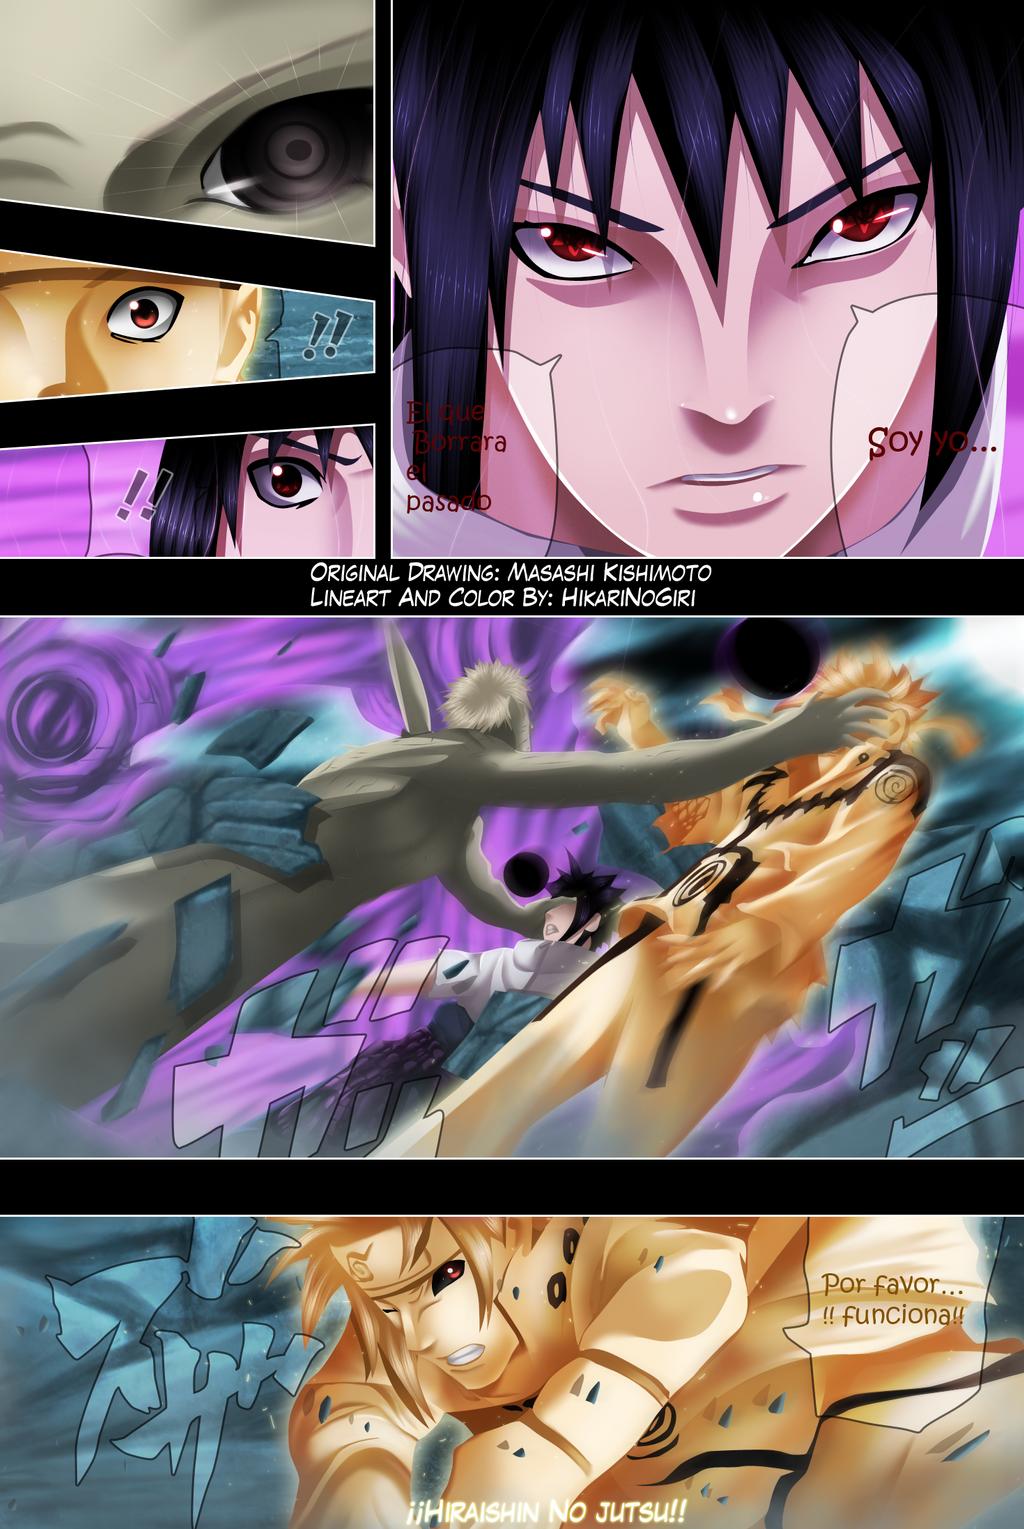 Naruto 639 - Obito The Destroyer by HikariNoGiri